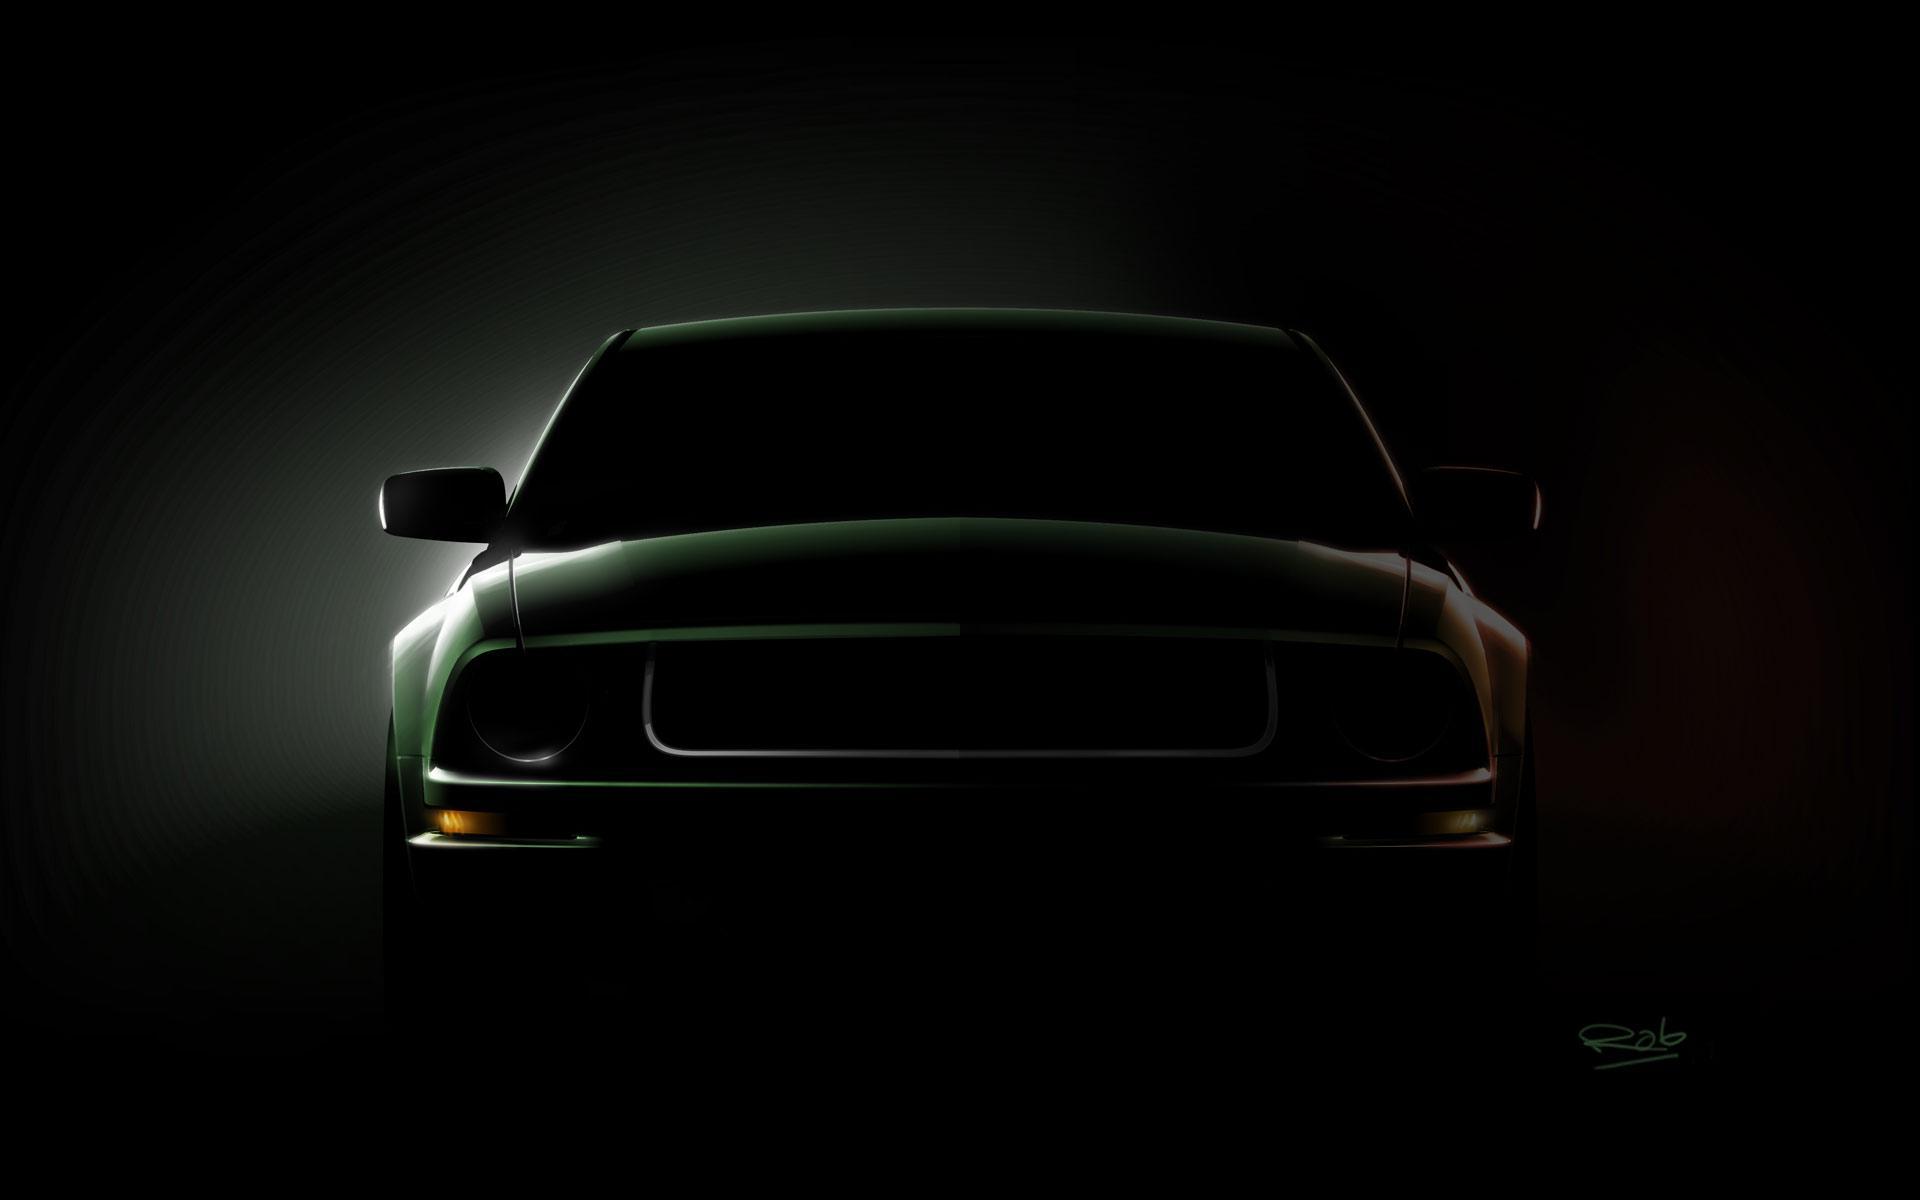 Mustang emblem wallpaper - photo#21